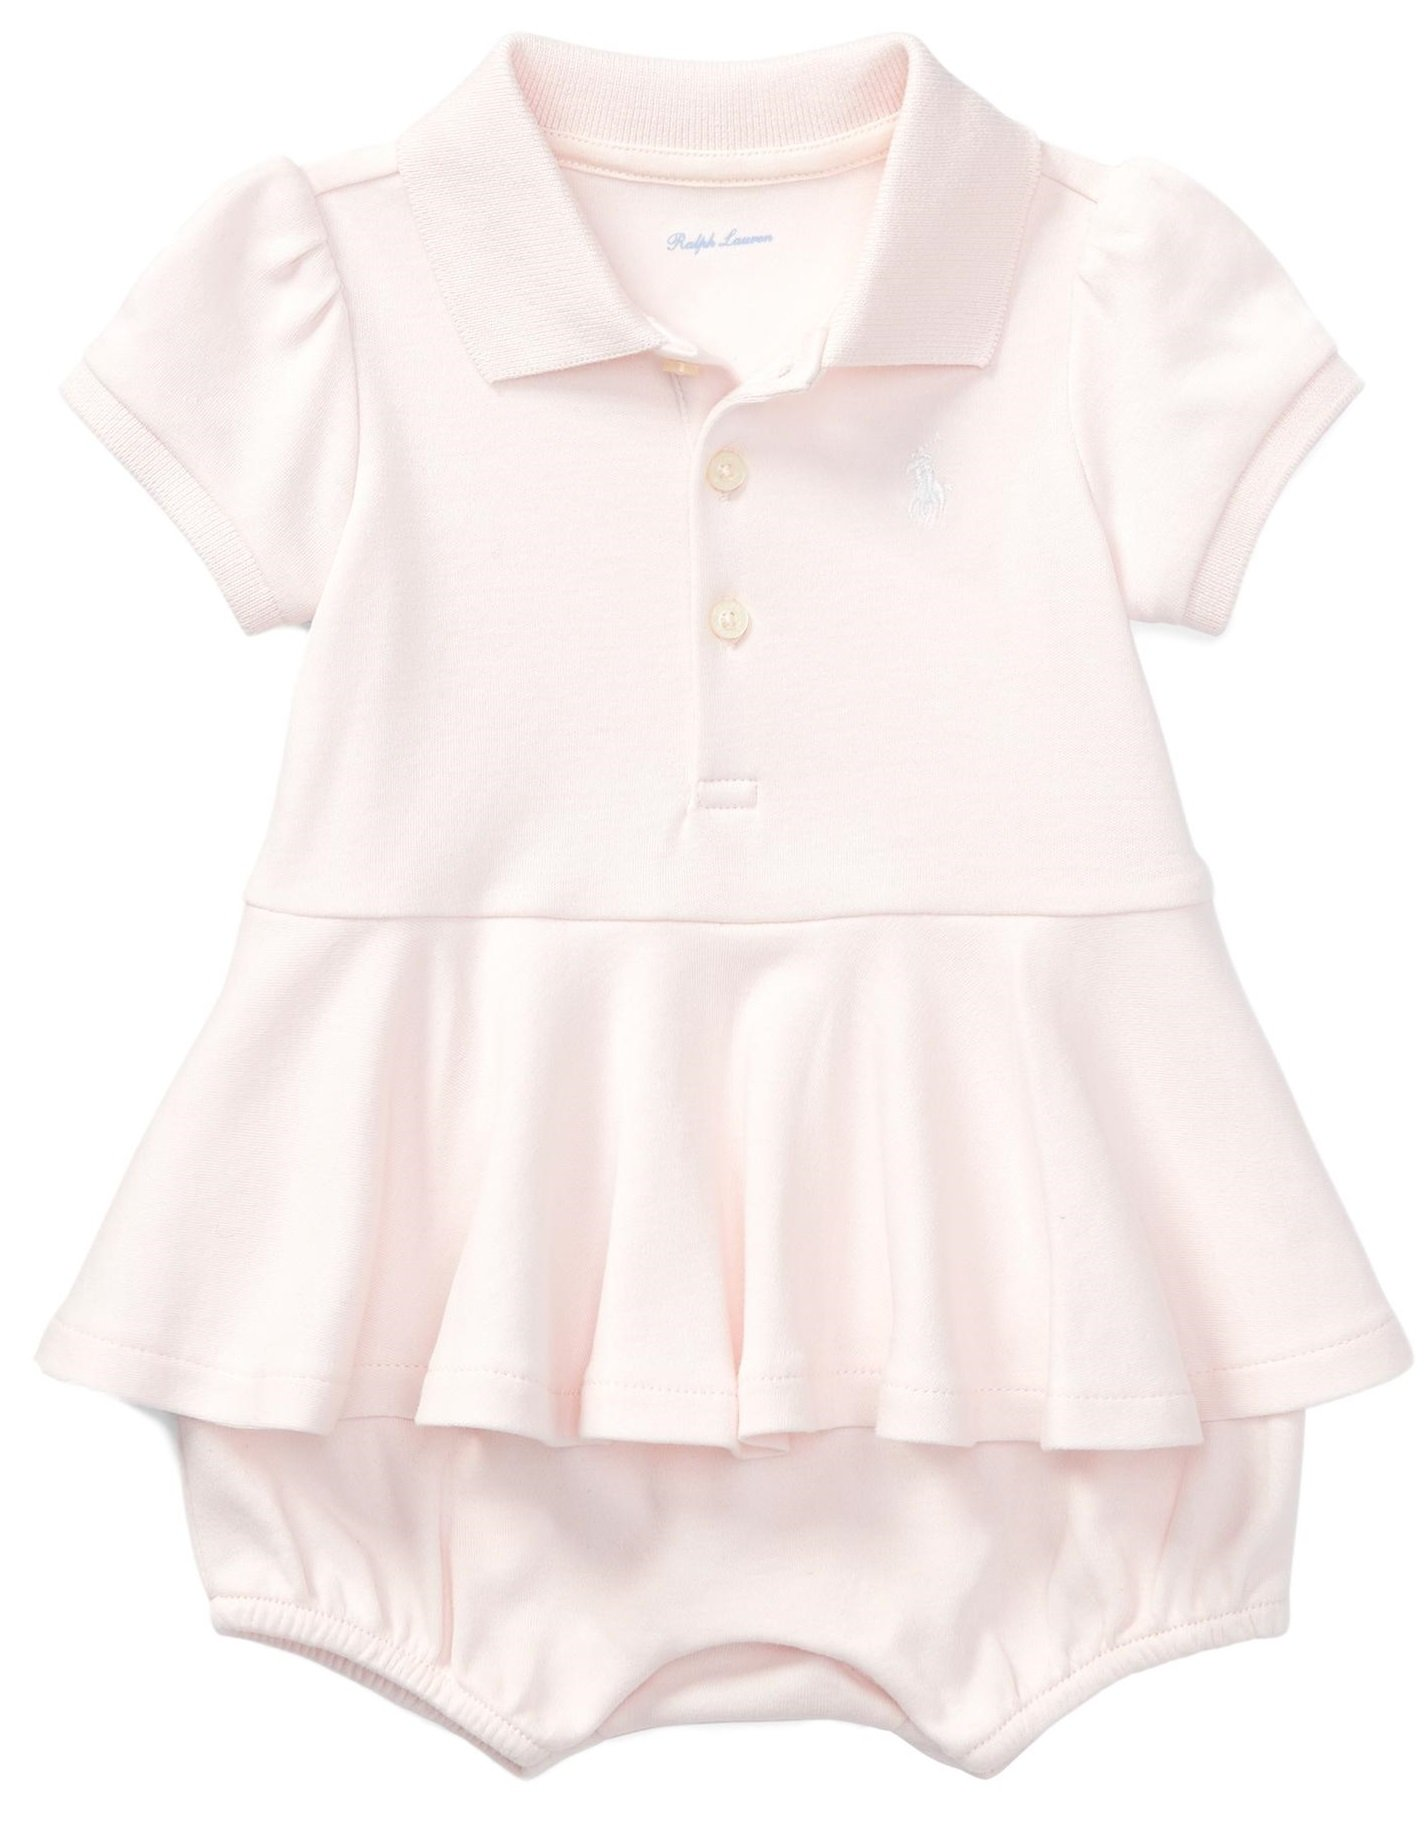 RALPH LAUREN Baby Girls Cotton Peplum Polo Romper